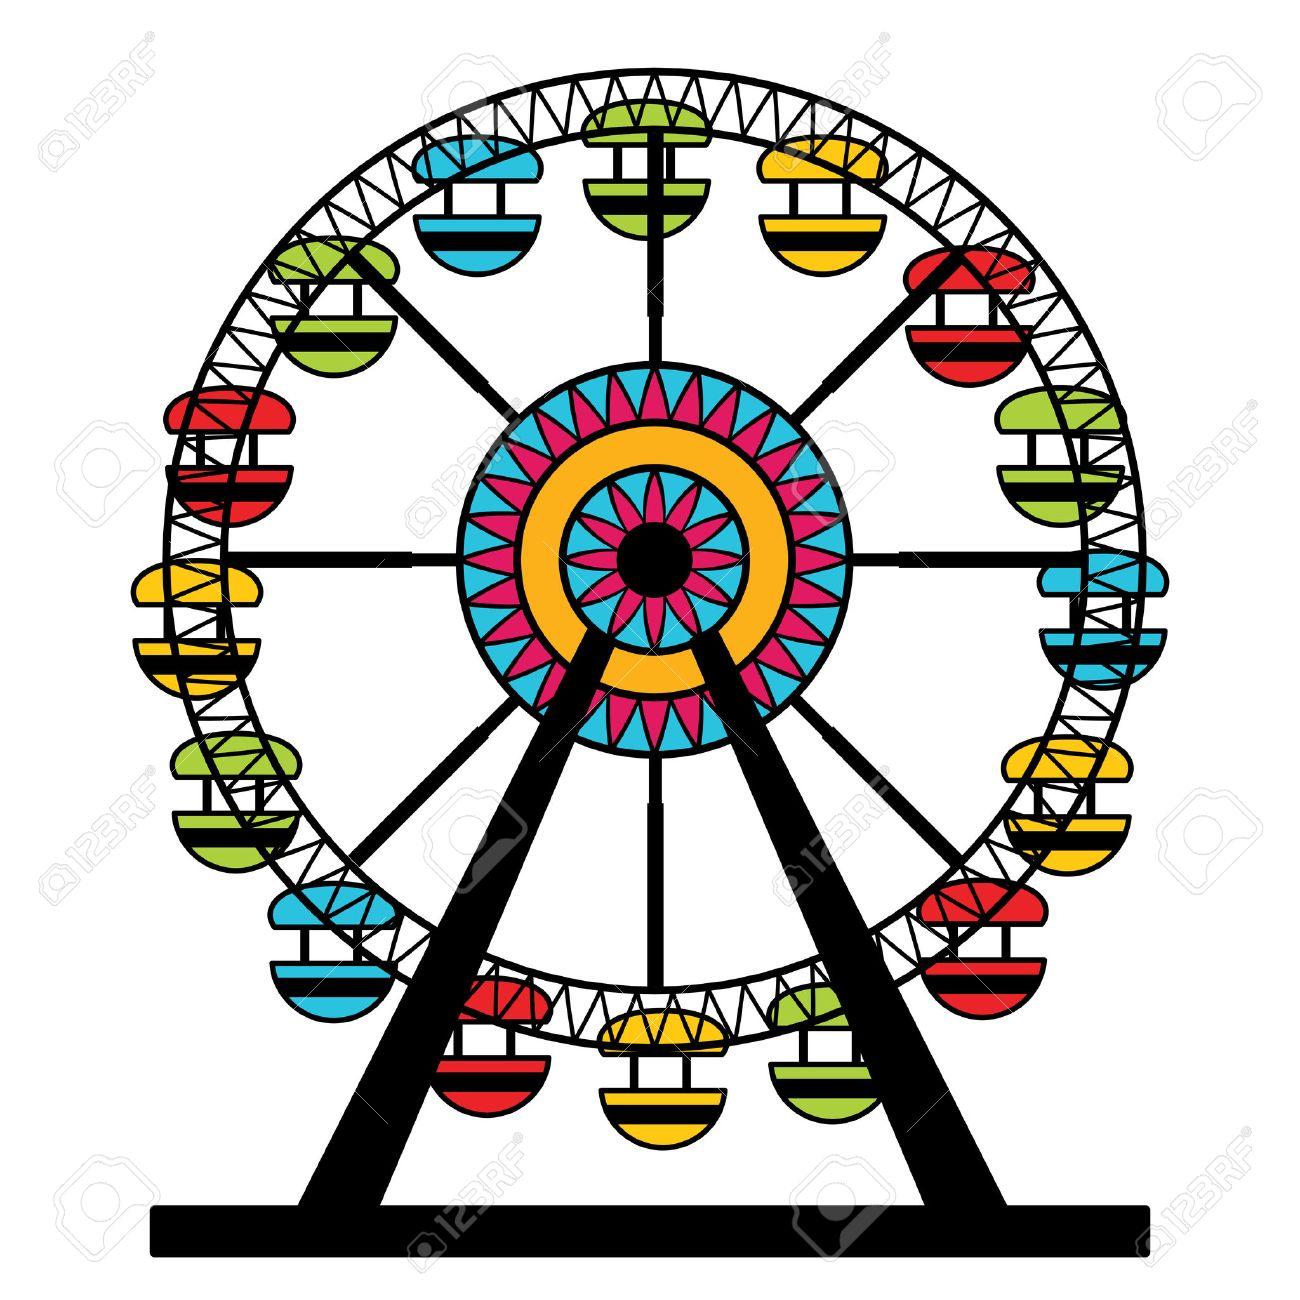 an image of a colorful ferris wheel amusement park ride royalty rh 123rf com ferris wheel clipart black and white ferris wheel clipart